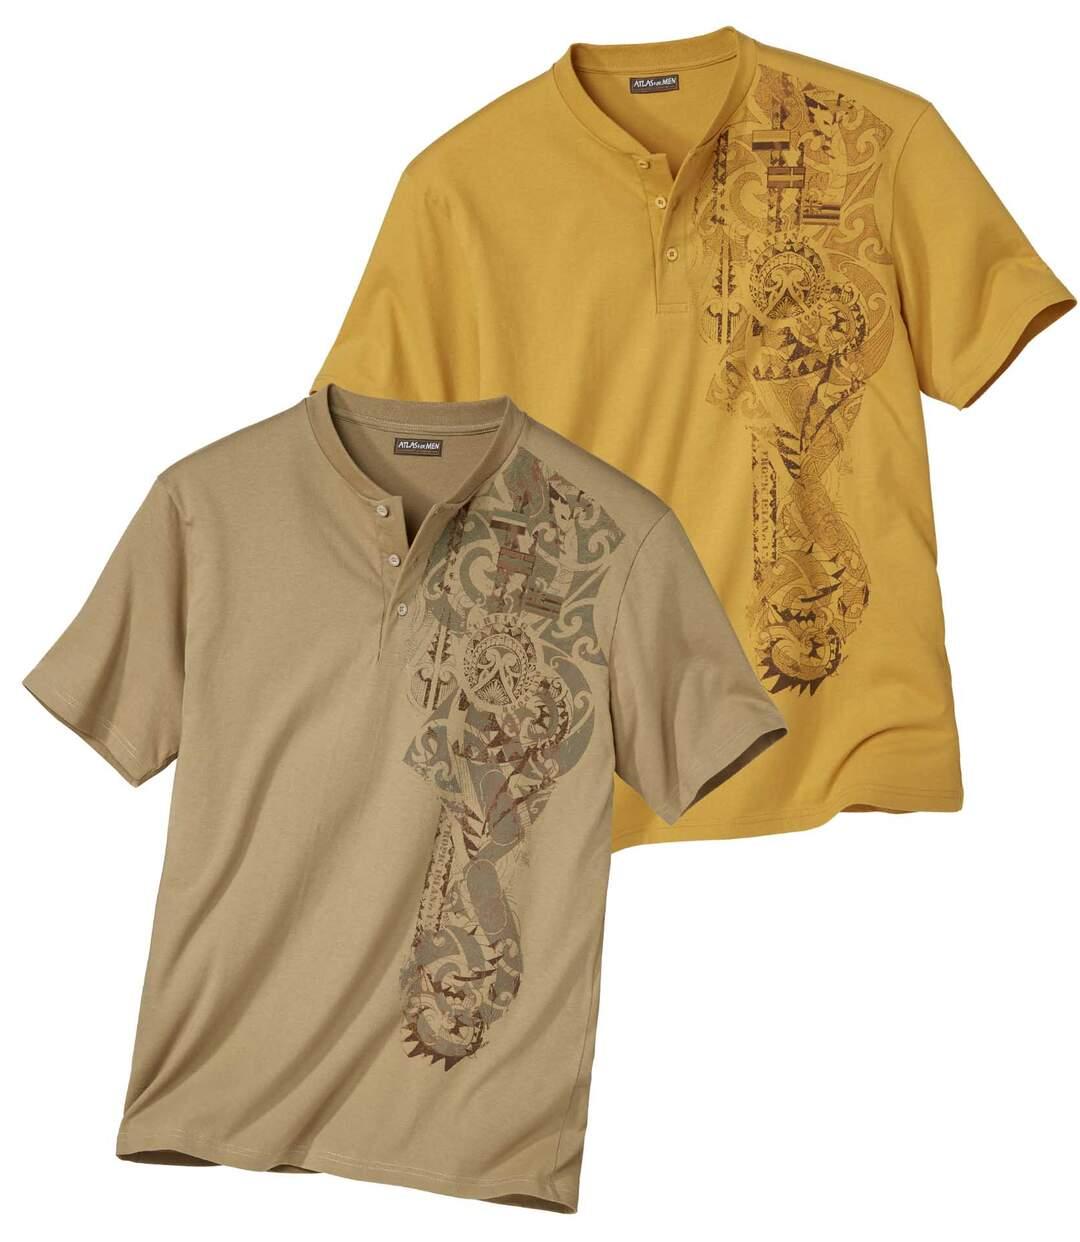 Pack of 2 Men's Maori Print T-Shirts - Ochre Beige